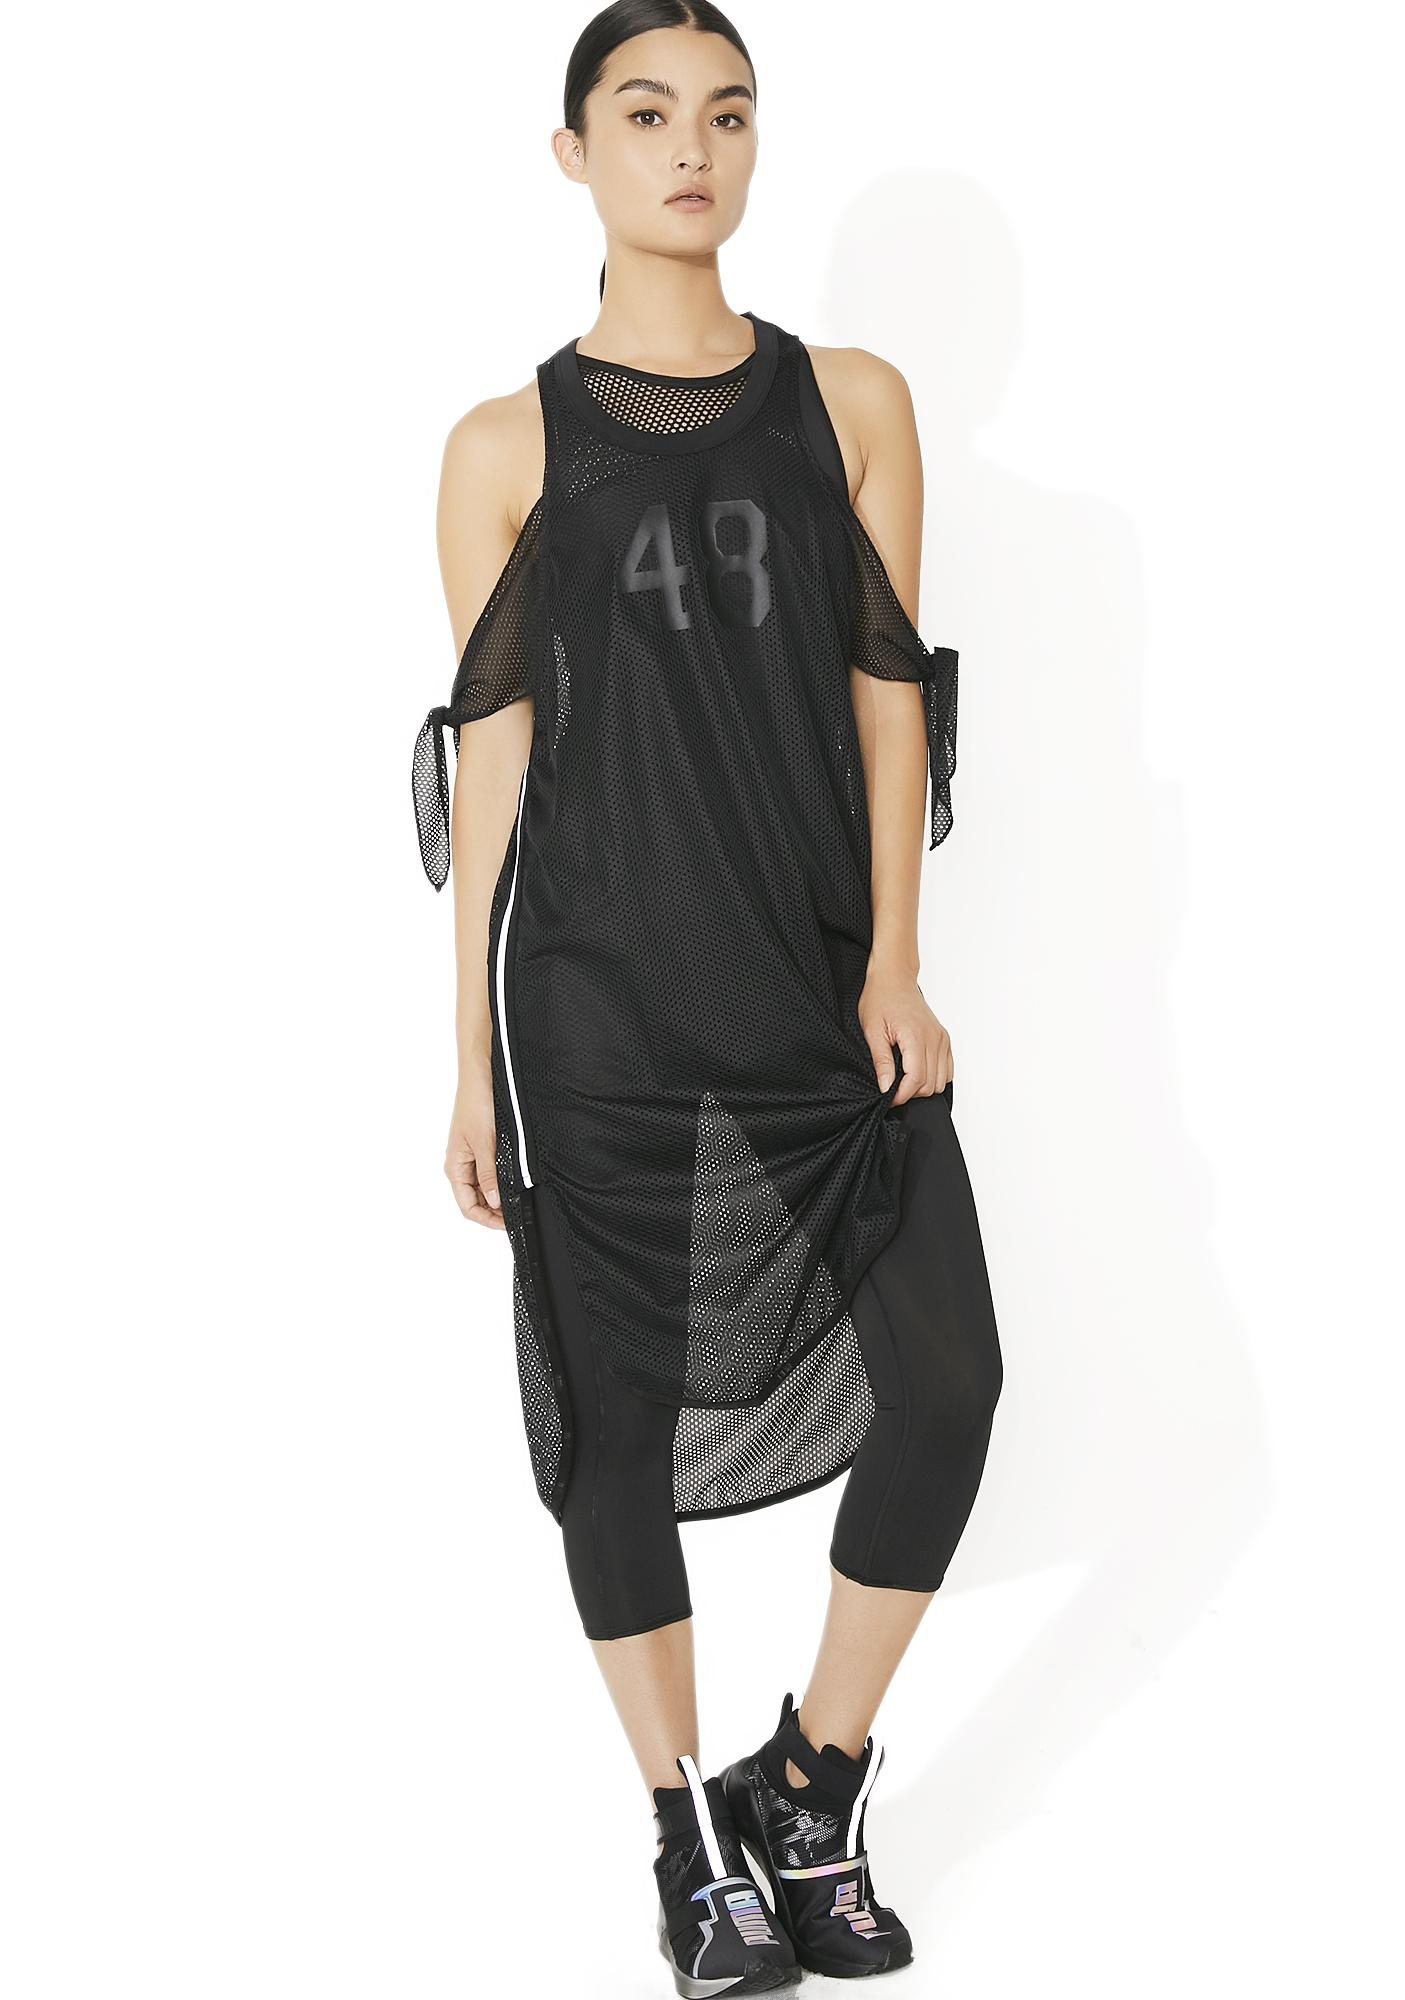 PUMA Xtreme Mesh Frill Dress